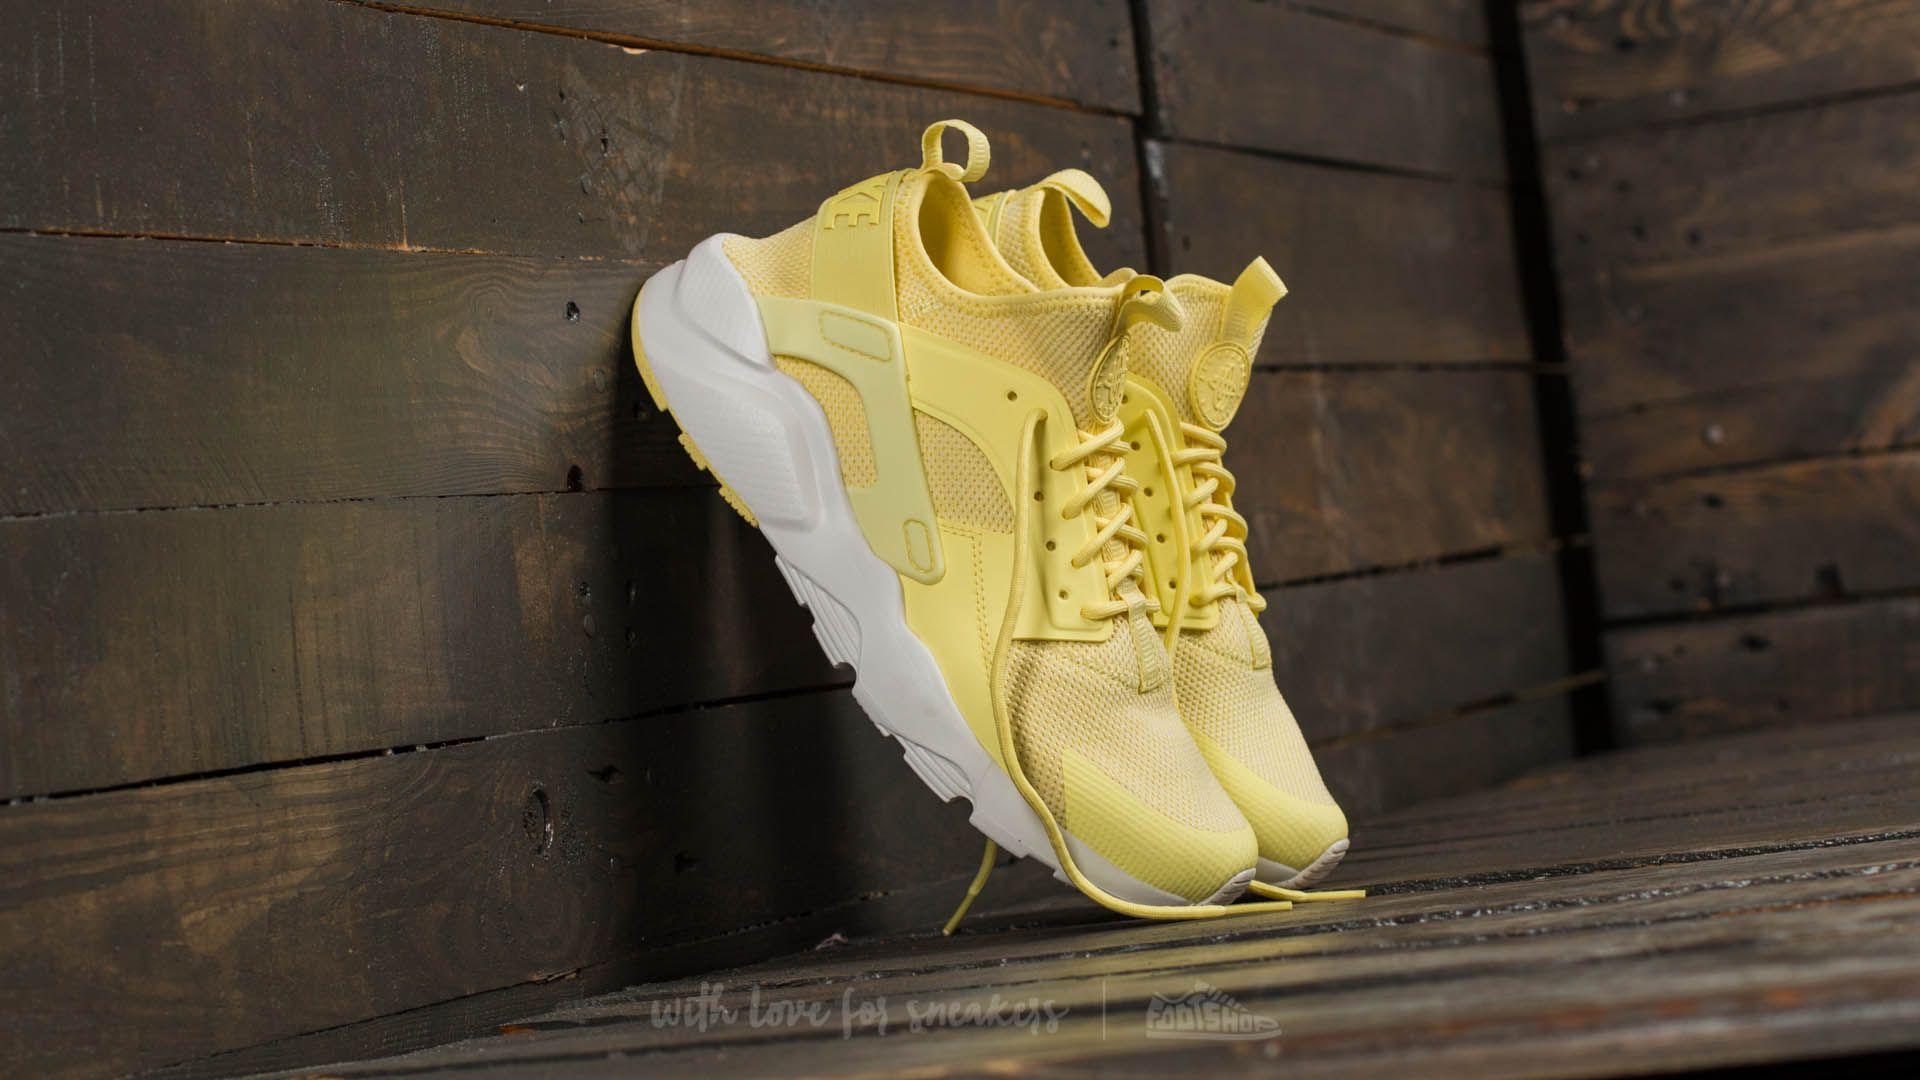 44ba9dadff3e Nike Air Huarache Run Ultra Br Lemon Chiffon  Lemon Chiffon ...